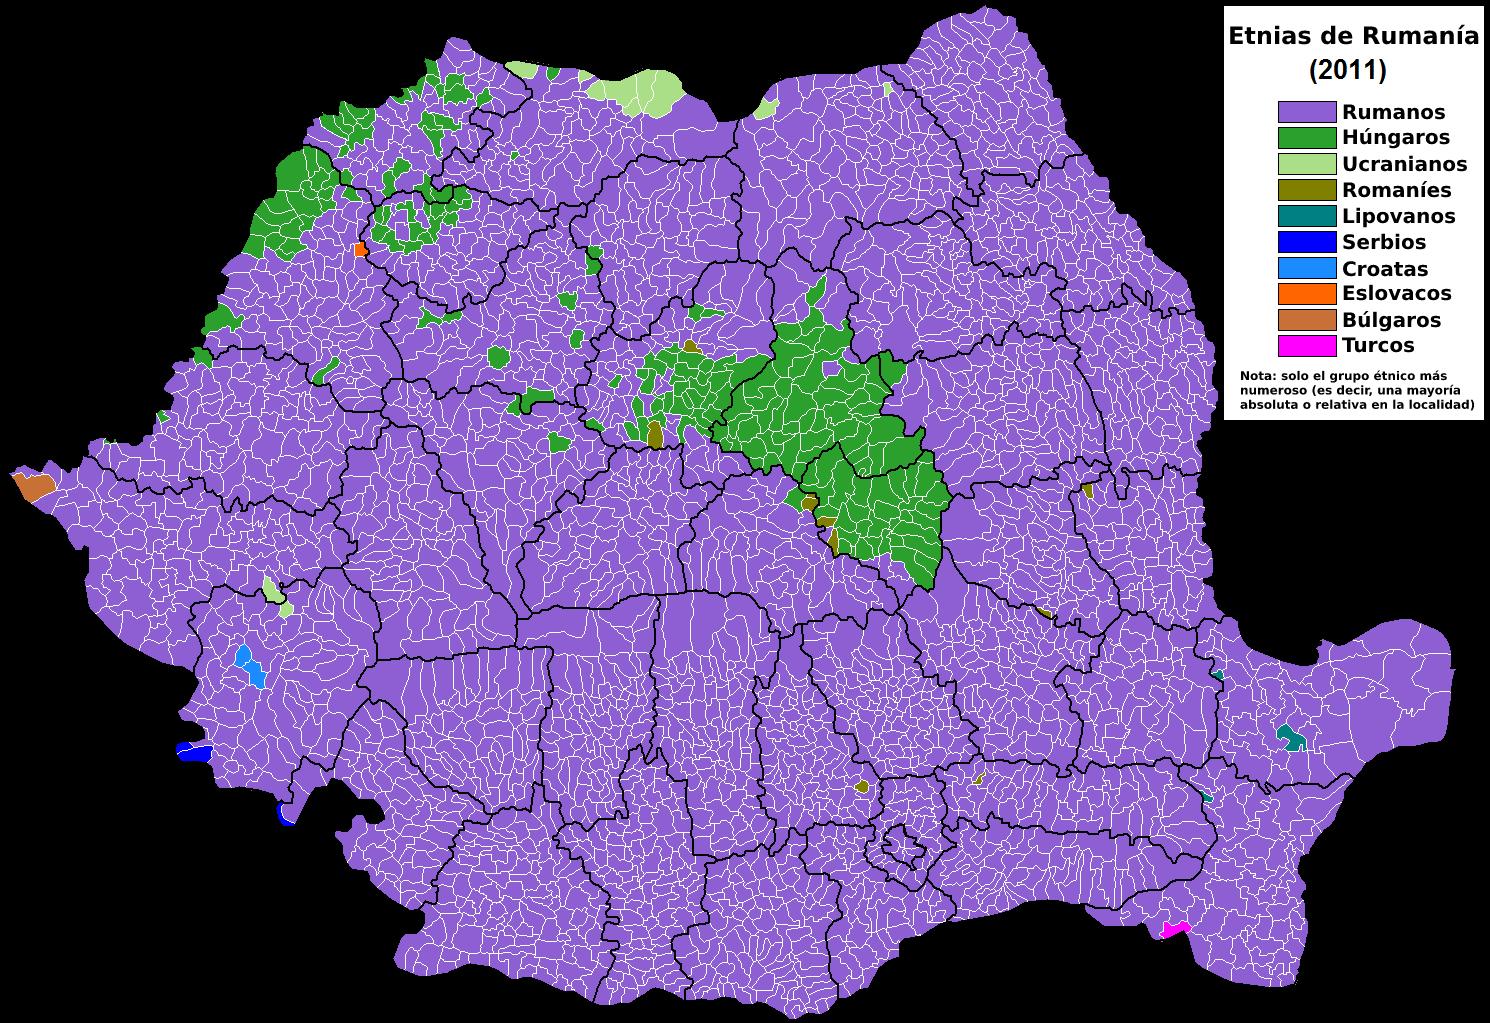 mapa de etnias de rumania